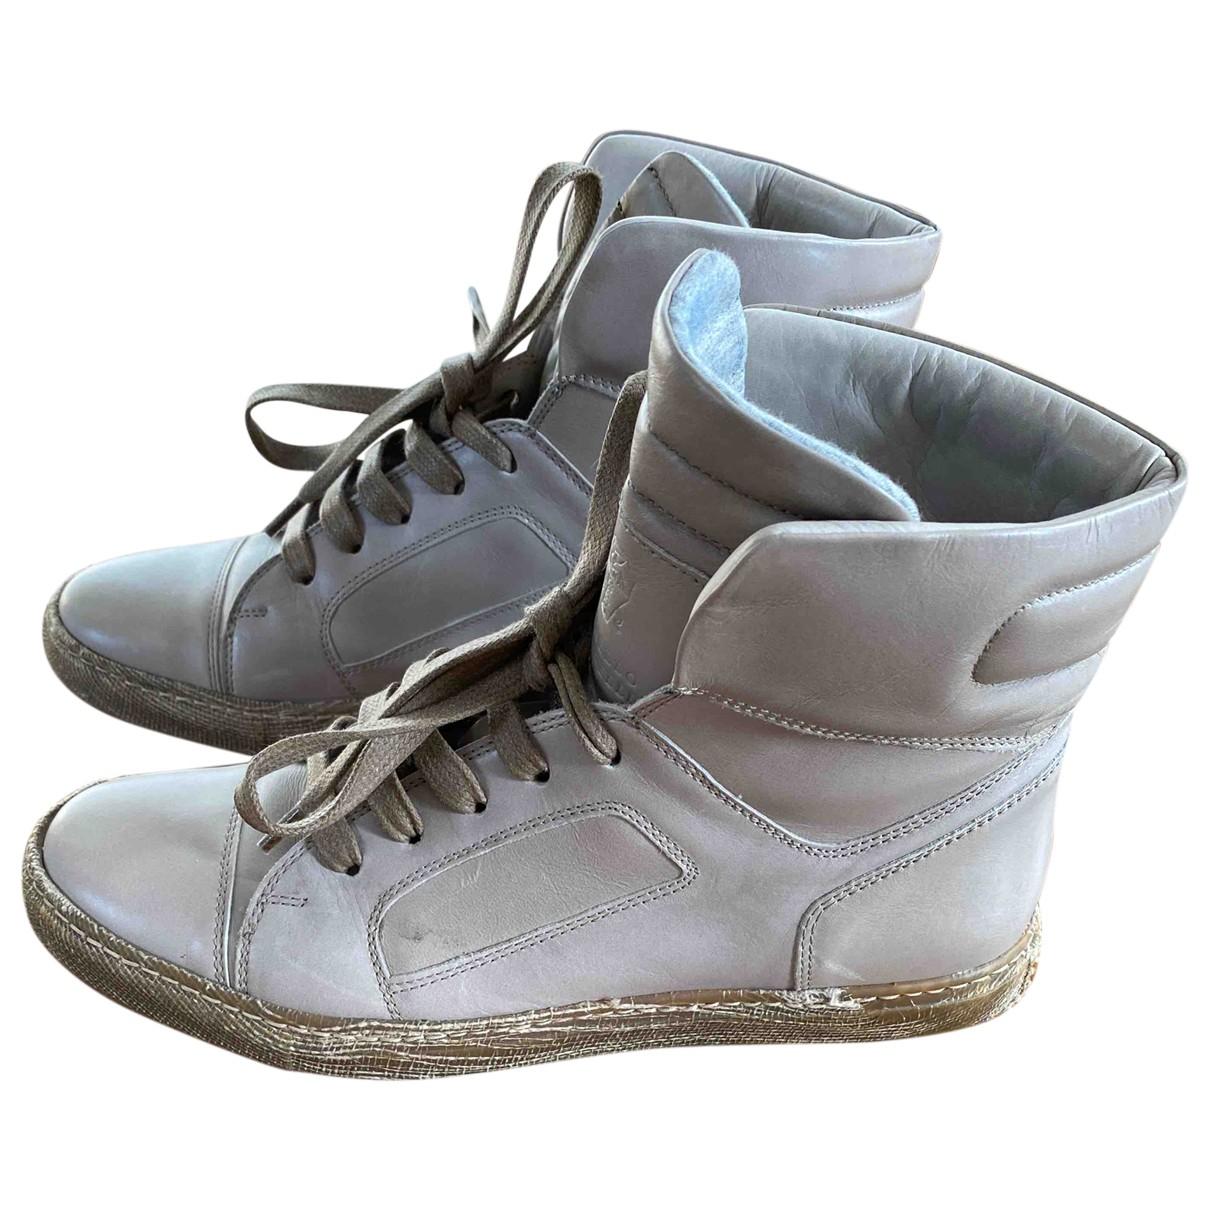 Brunello Cucinelli N Beige Leather Trainers for Women 37 IT